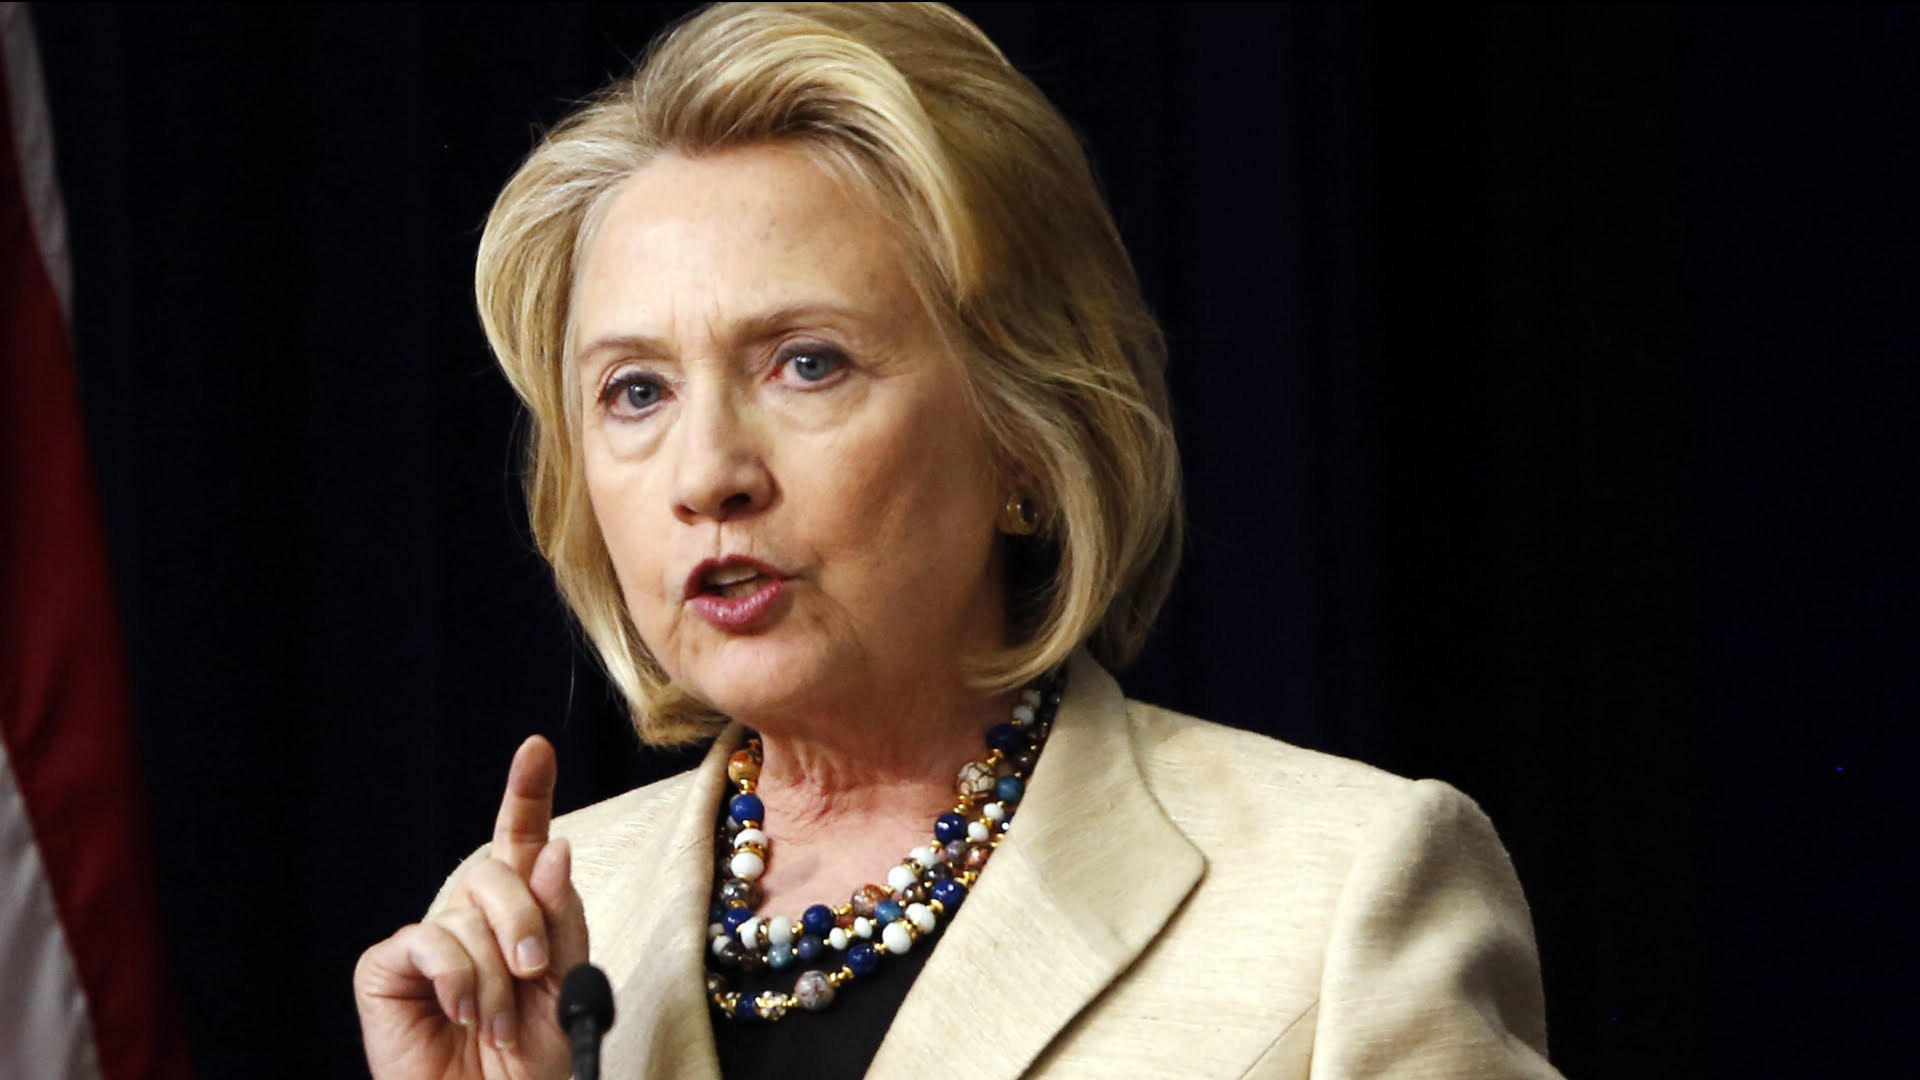 Hillary Clinton Wallpaper For Computer